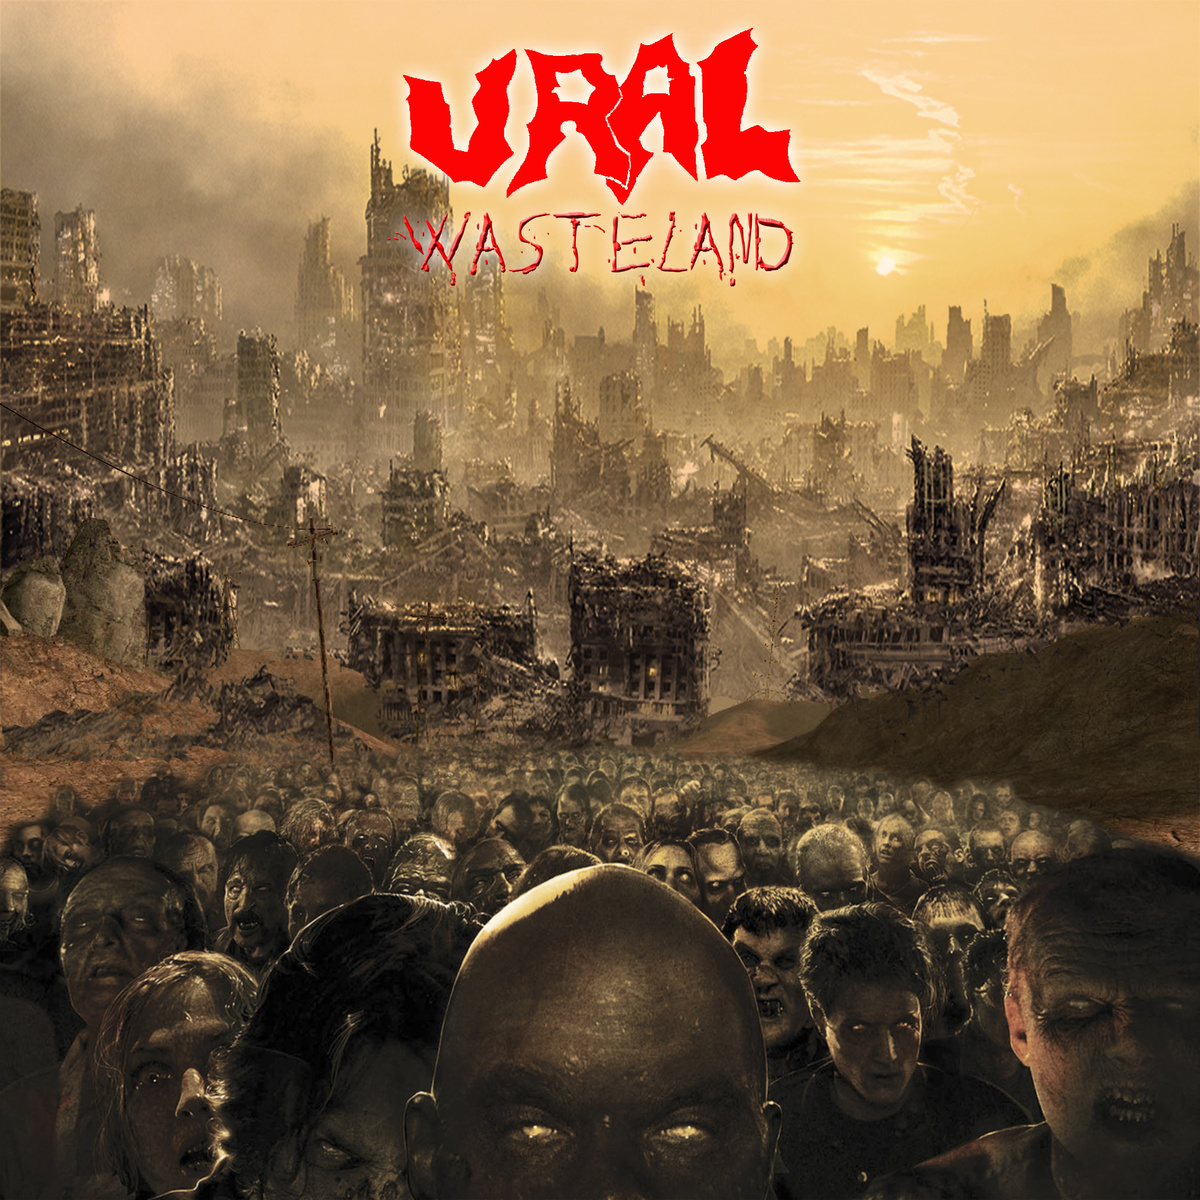 URAL – Wasteland EP